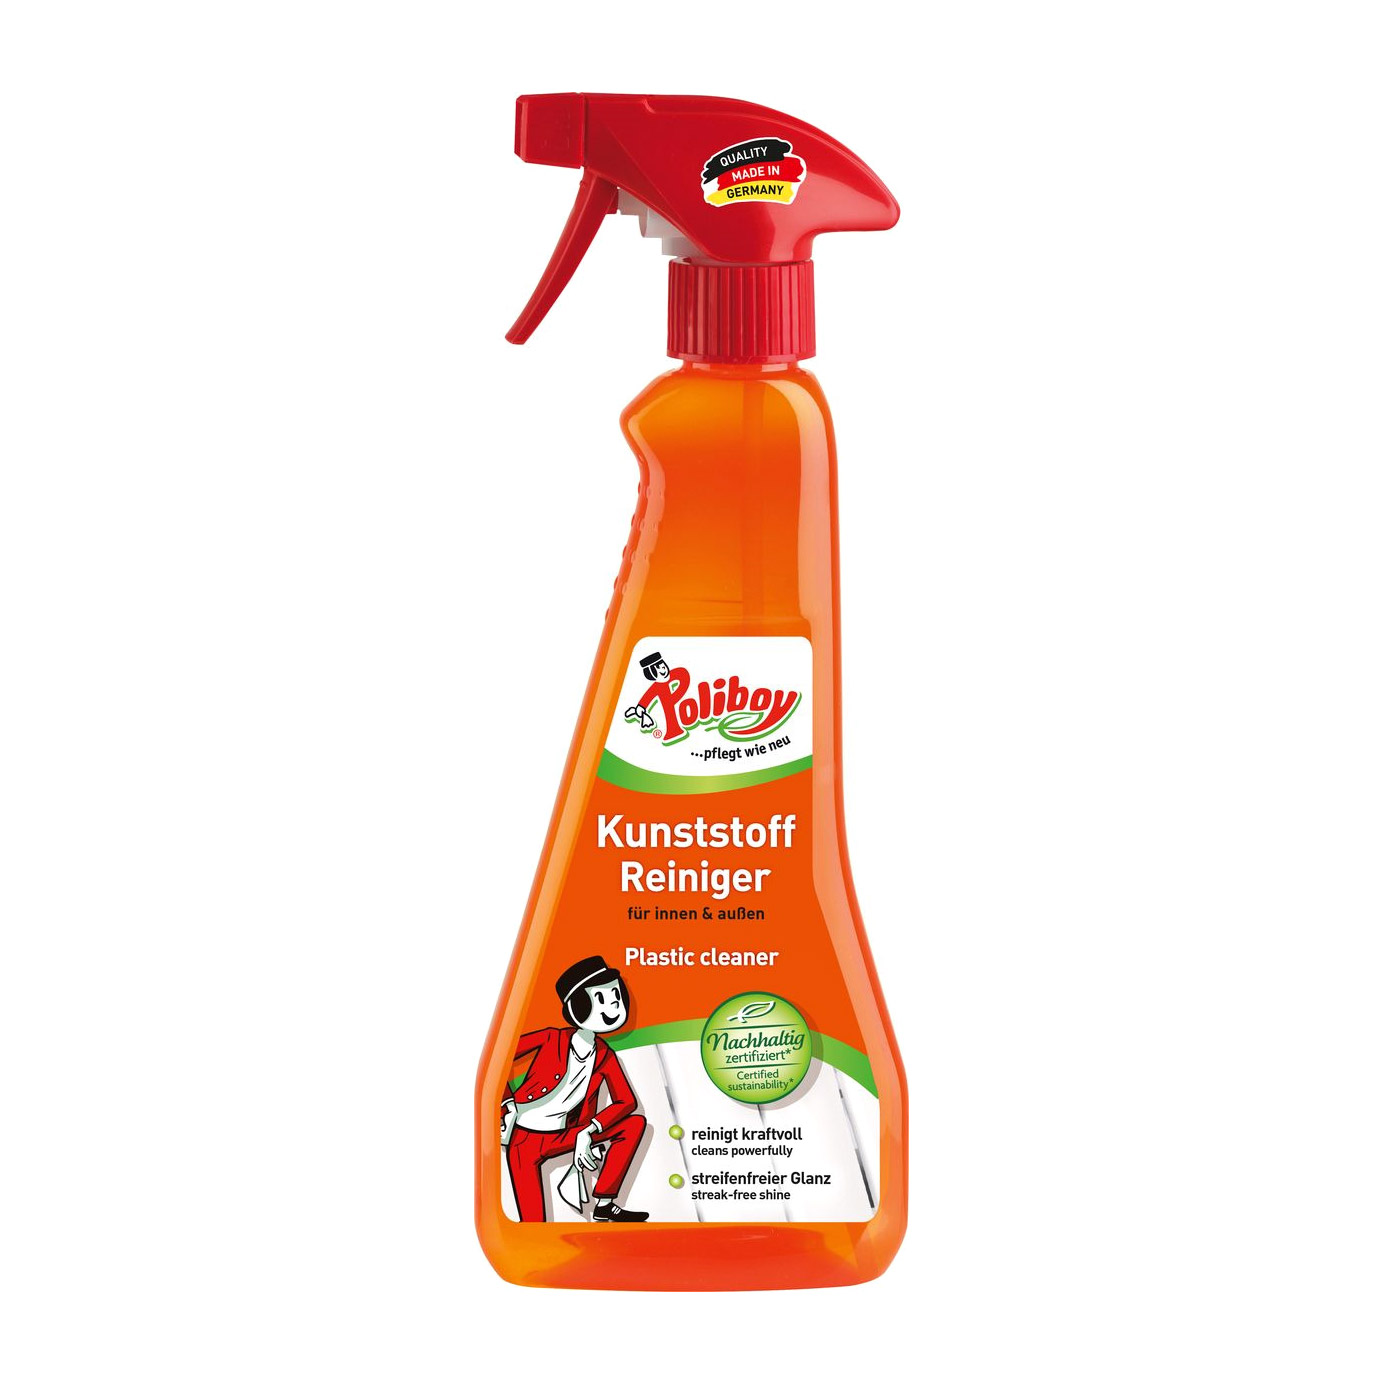 Средство для ухода за пластиковыми поверхностями Poliboy Organic 375 мл poliboy средство по уходу за пластиковыми поверхностями kunstoff reiniger 0 375 л